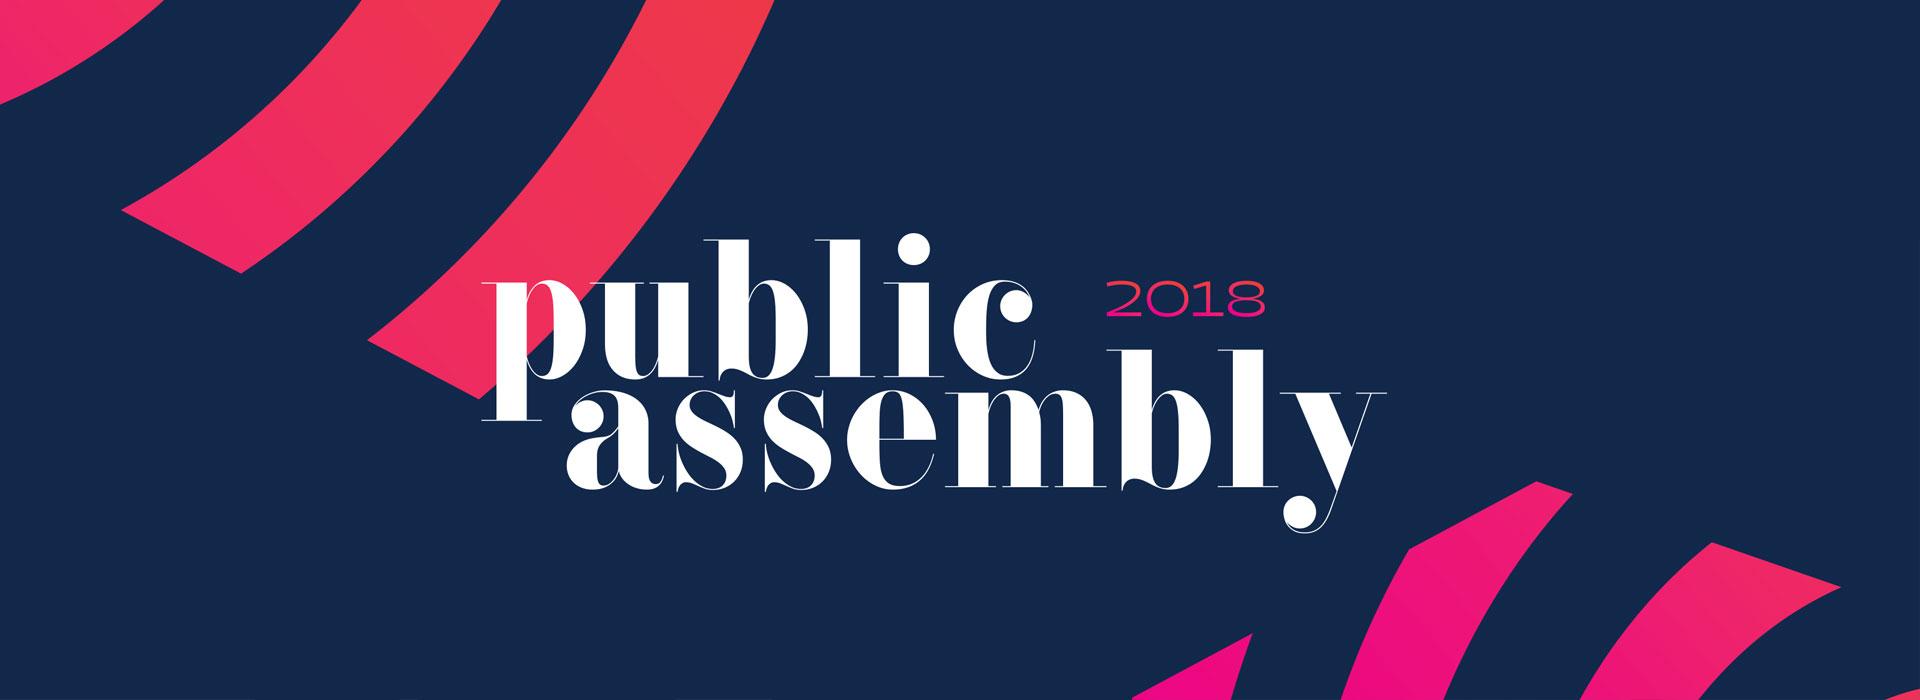 Public Assembly - Branding, Logo Design, Identity Design